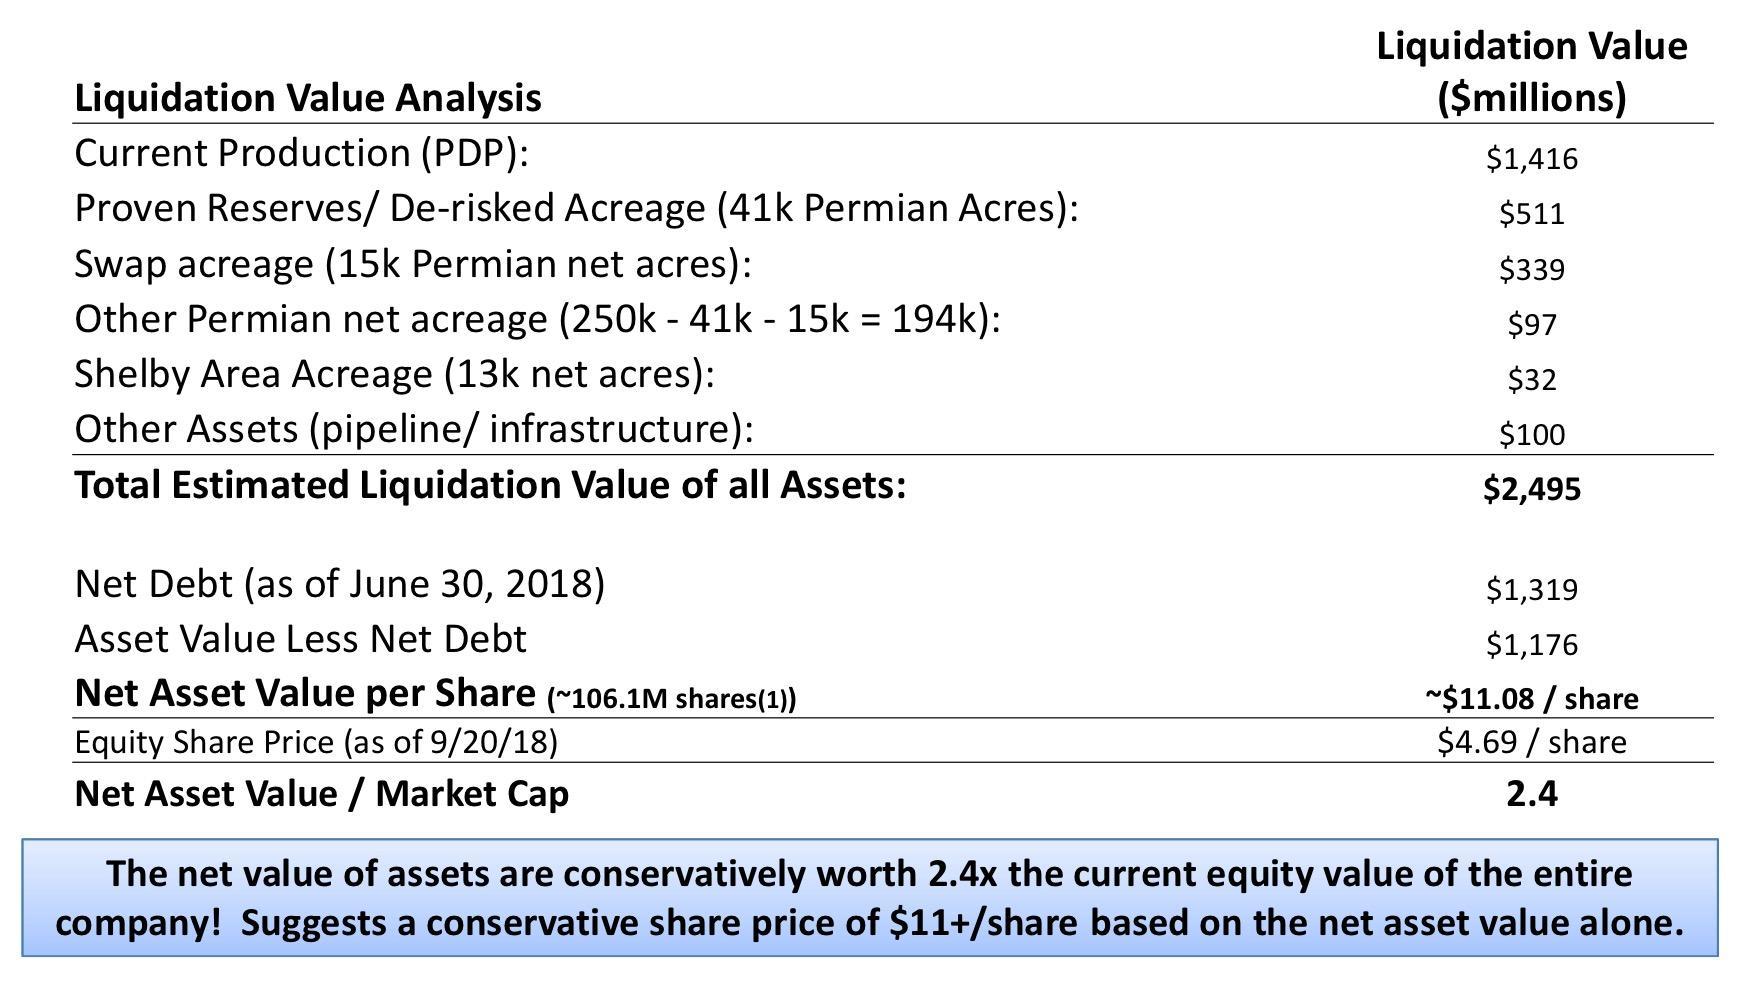 Self liquidating asset implies means